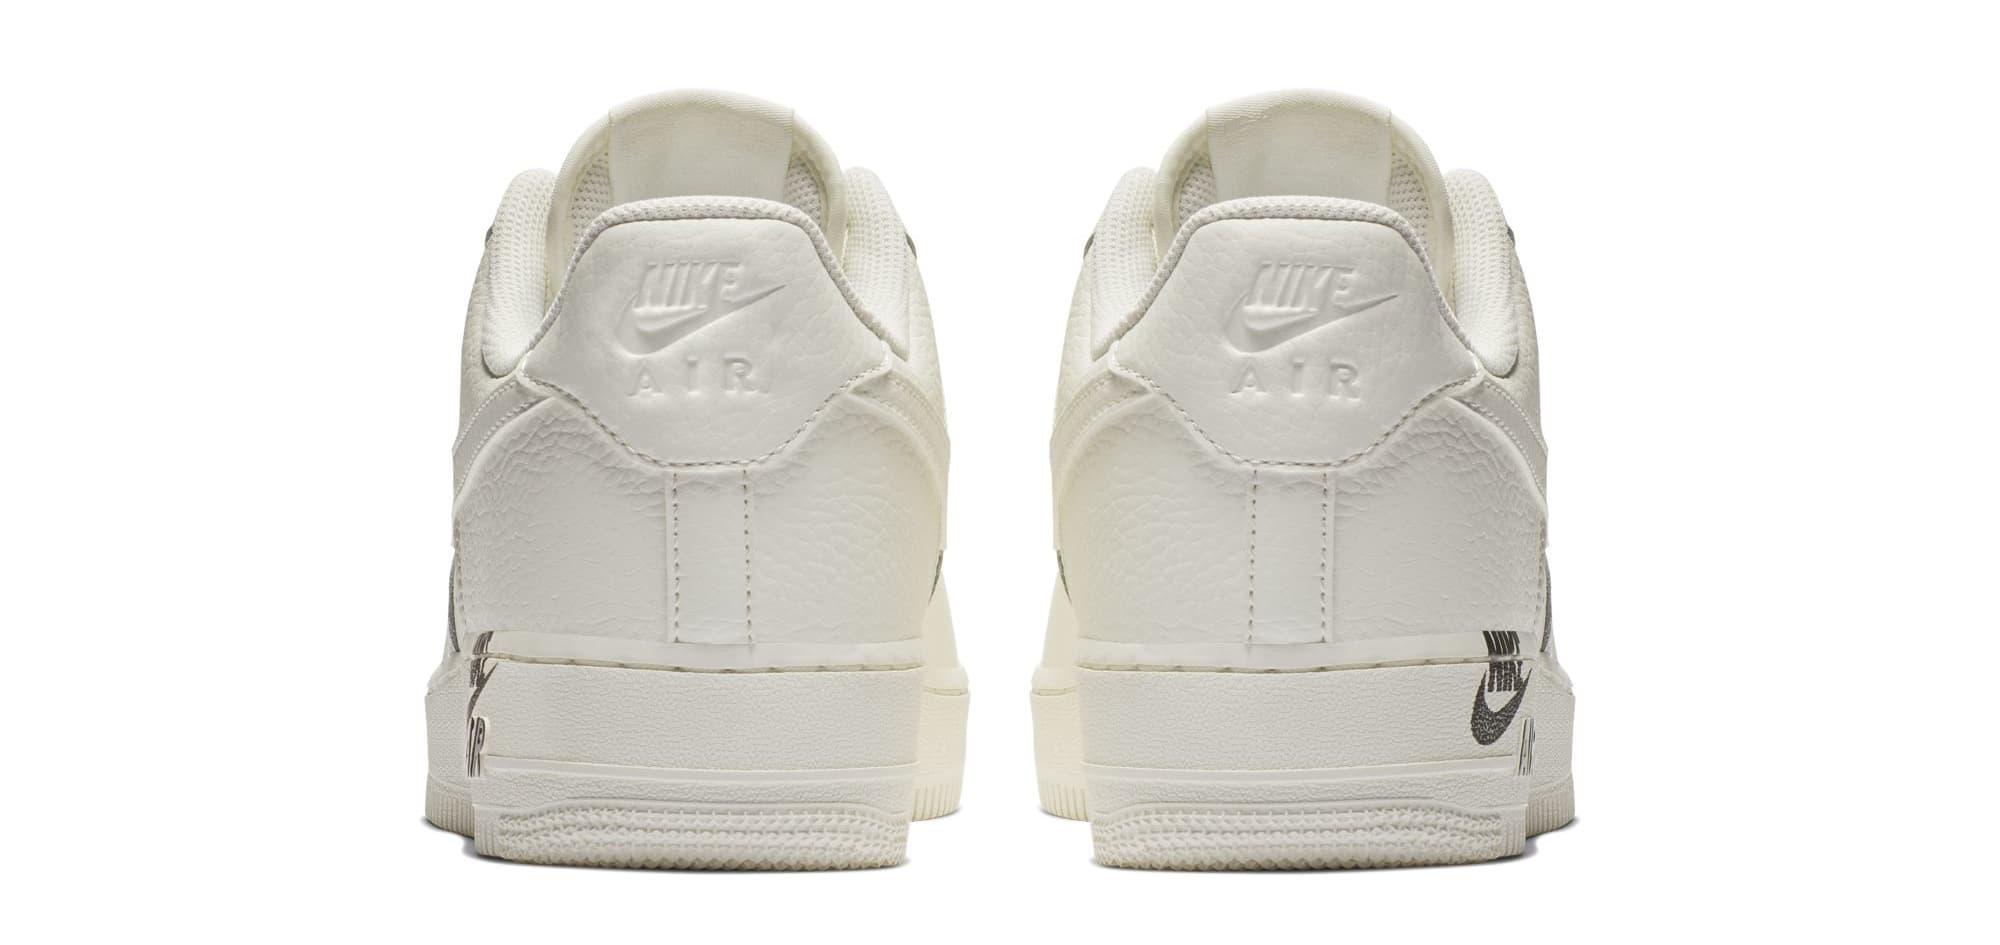 Nike Air Force 1 Low  07 LTHR 'Sail' (Heel)